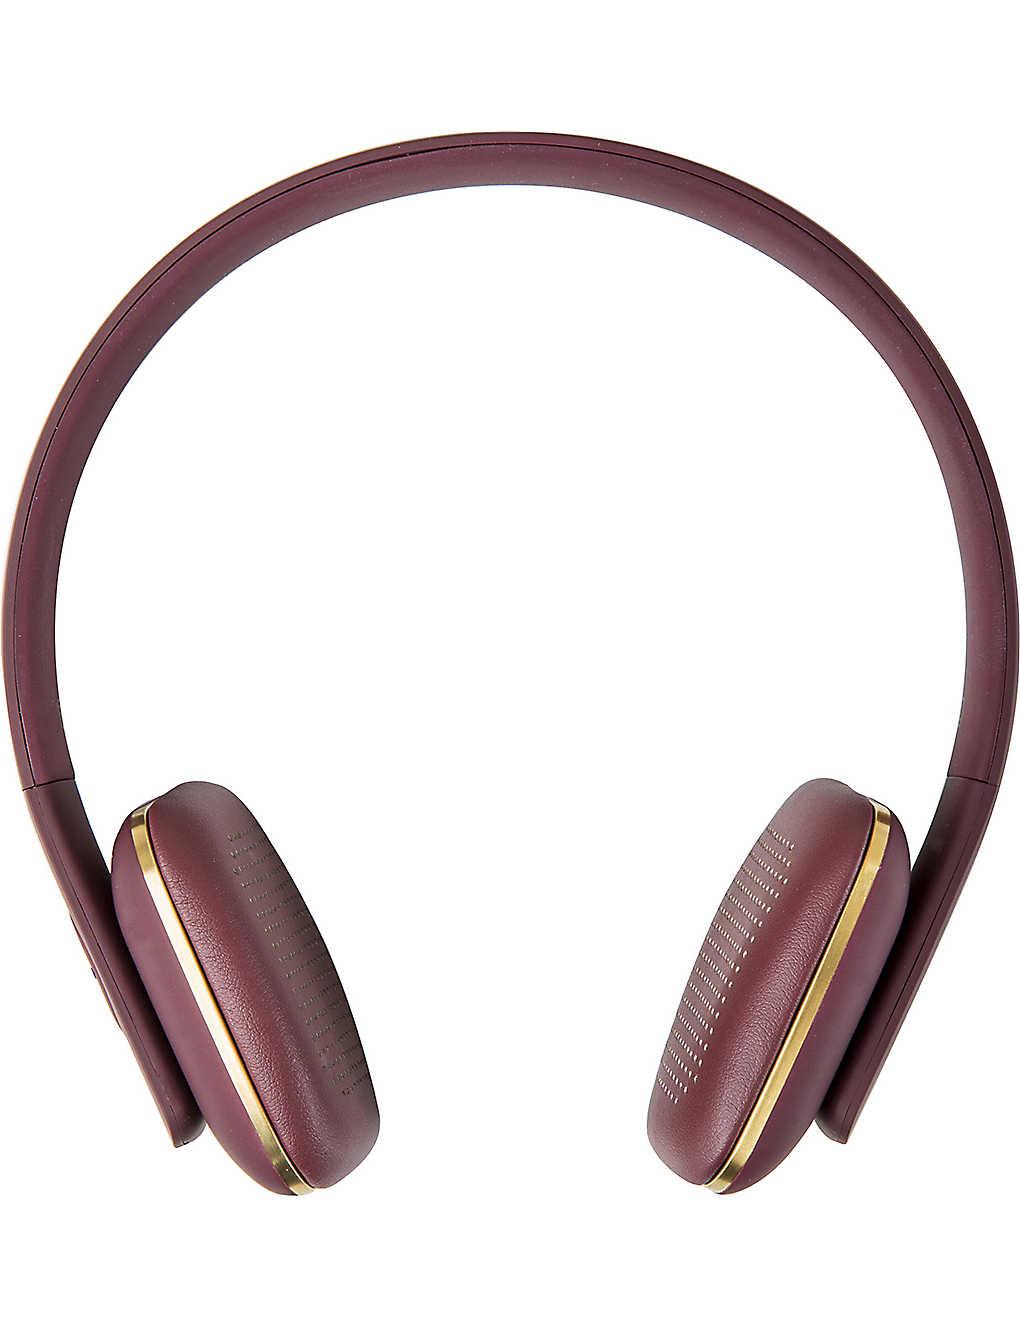 555089dfac0 THE CONRAN SHOP - Kreafunk aHead wireless headphones   Selfridges.com